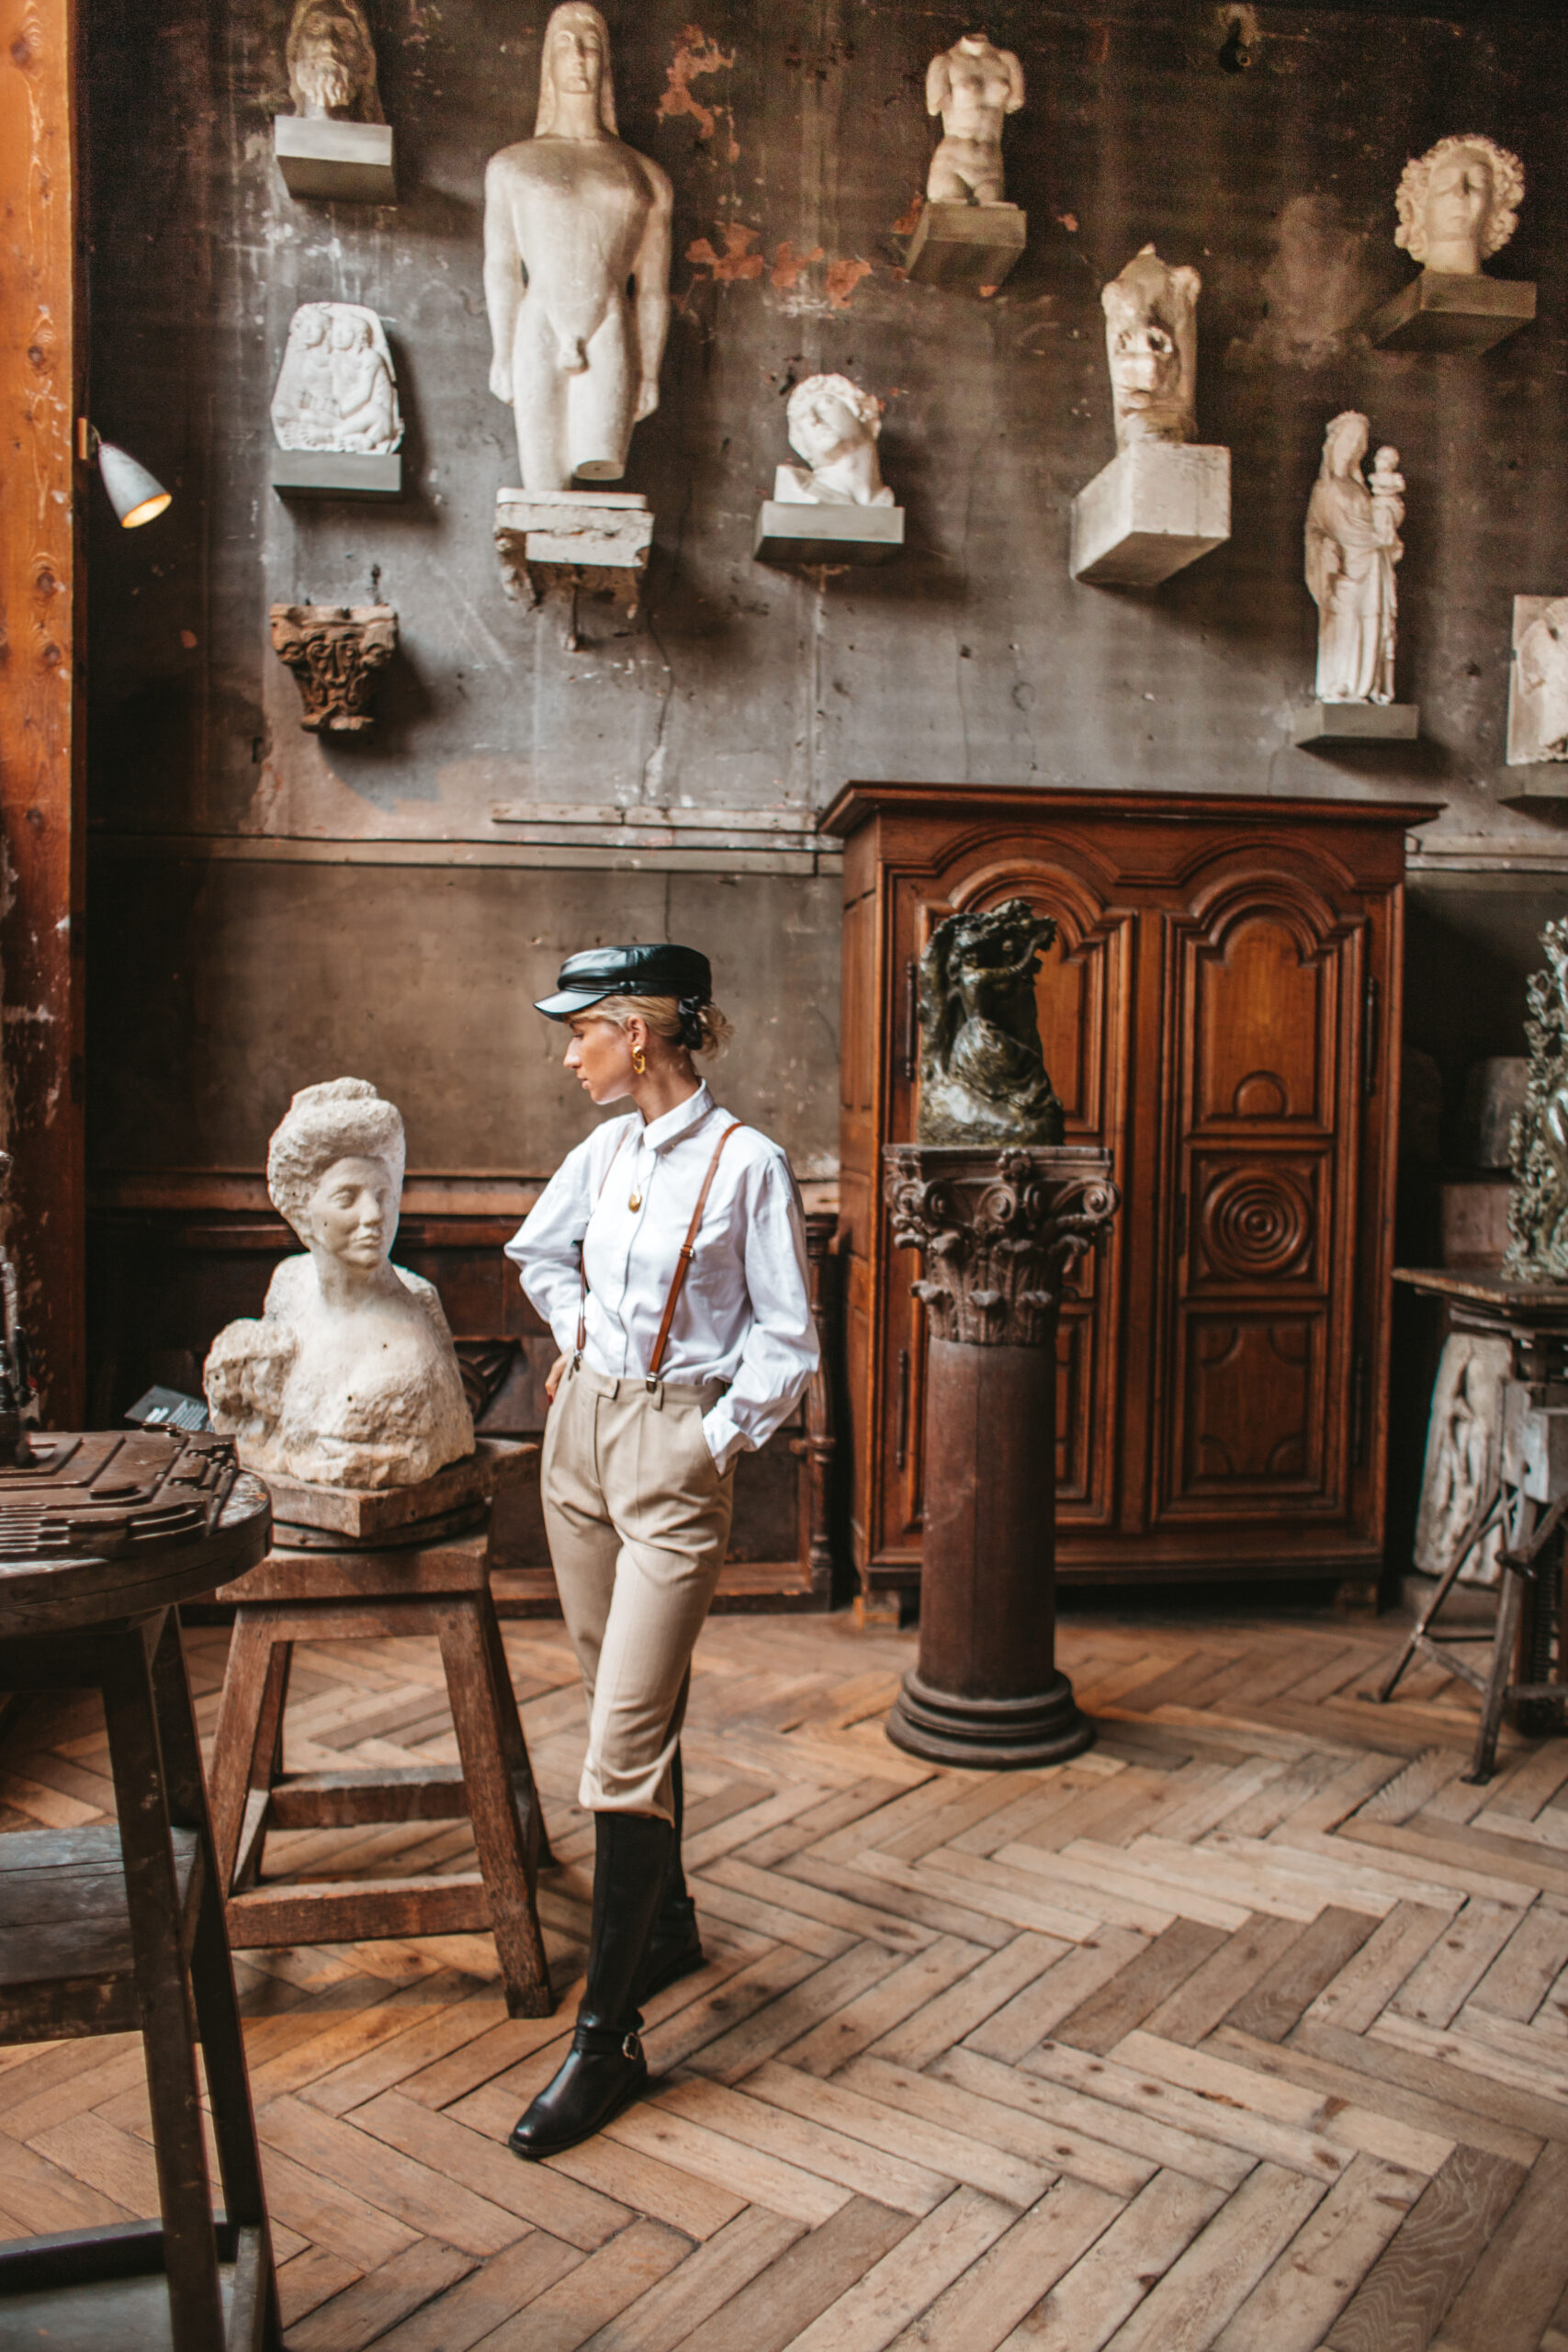 Muzeum Rodina, Musée Rodin, Rodin Museum, muzea Paryż, ciekawe miejsca w paryżu